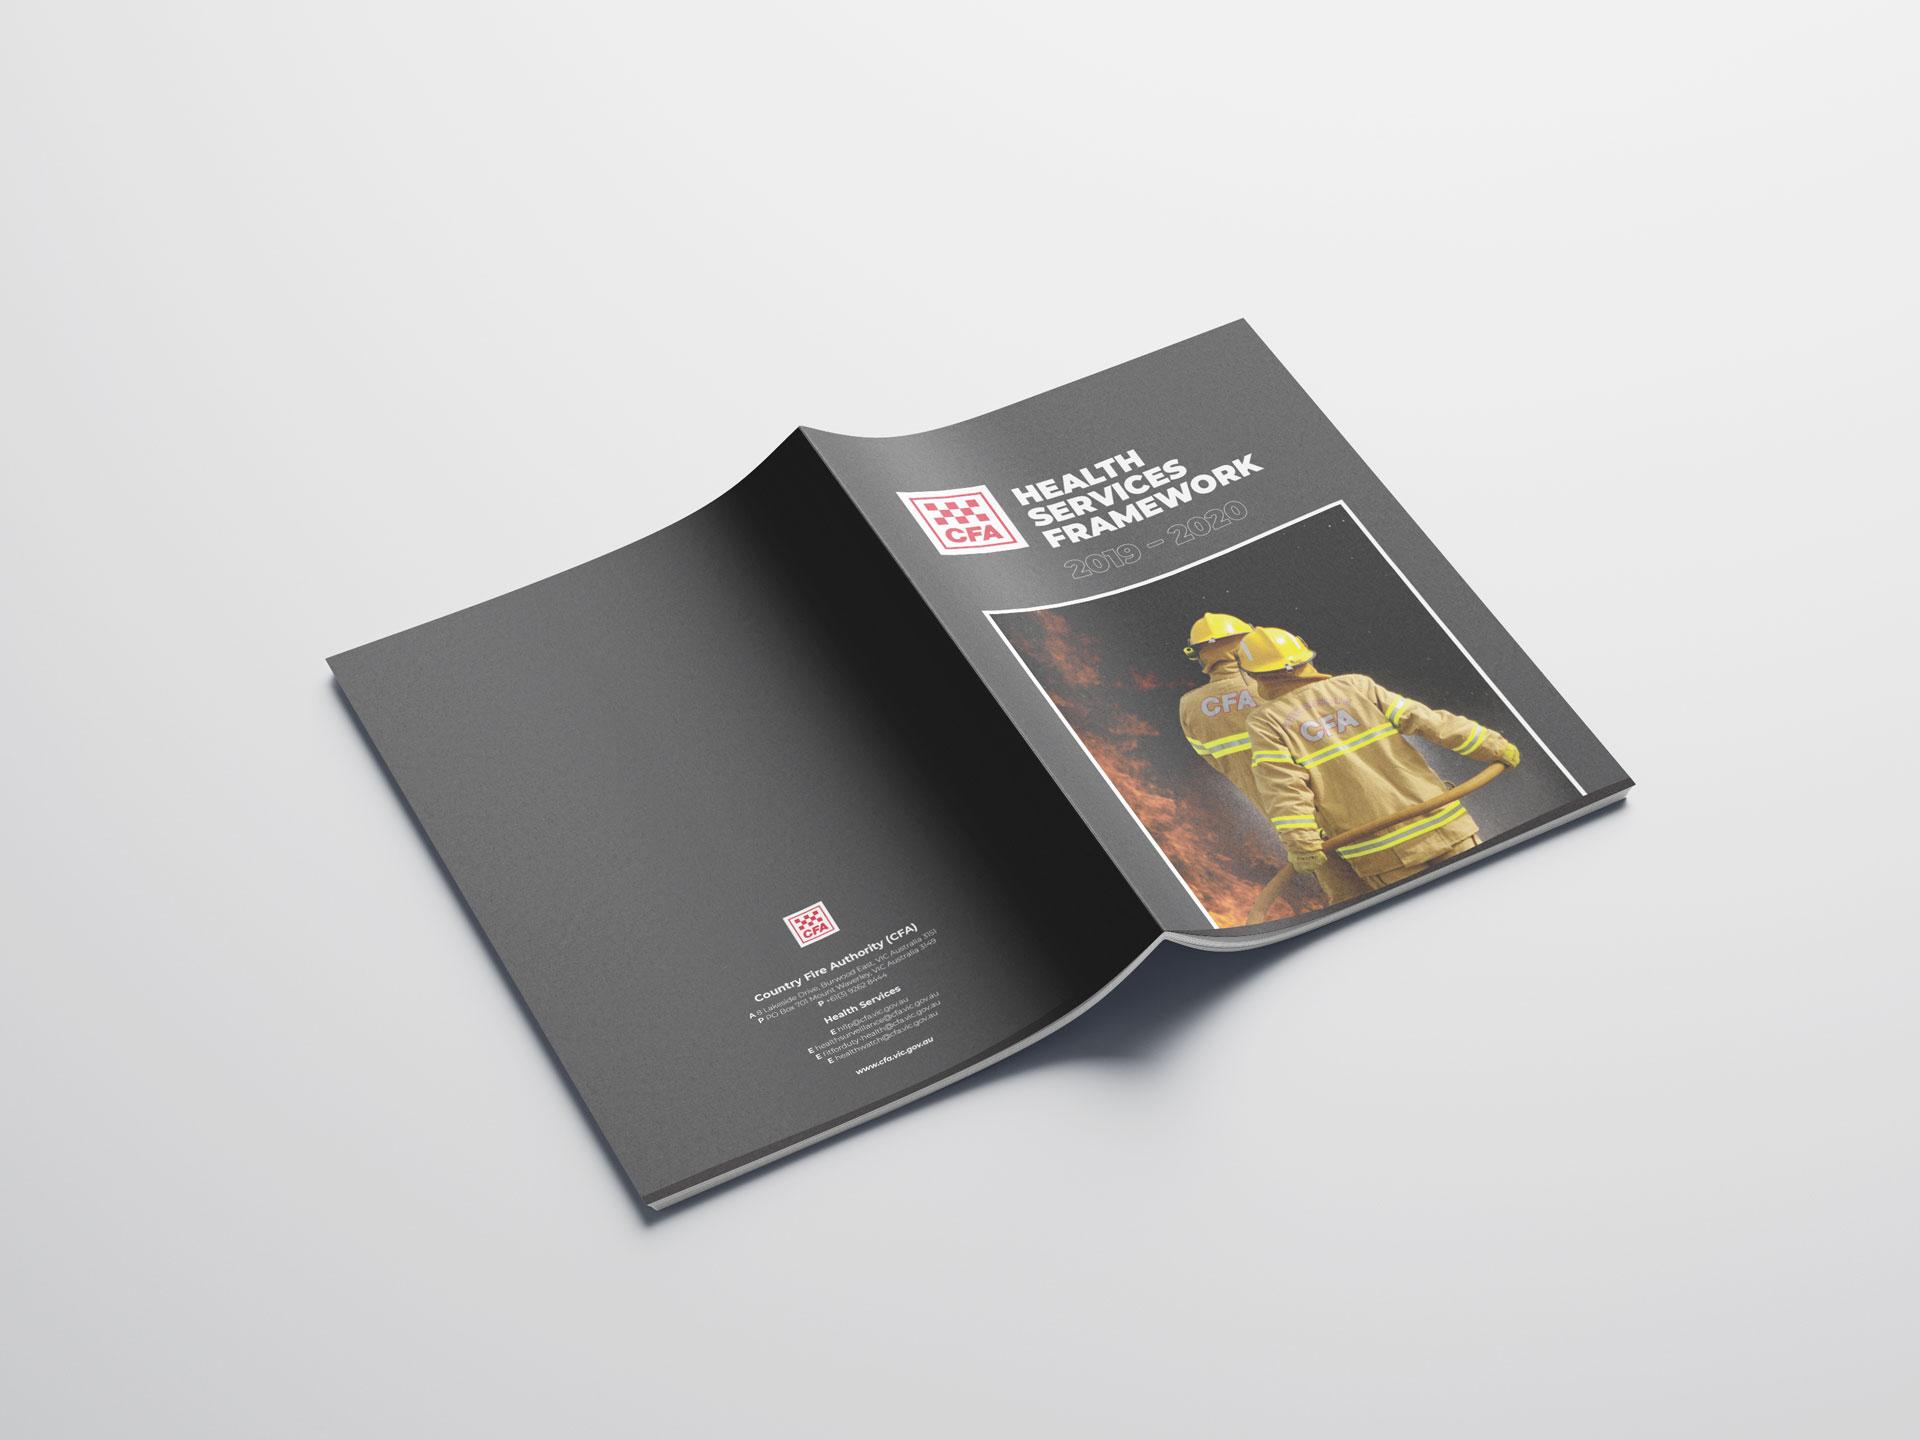 Country Fire Authority Handbooks